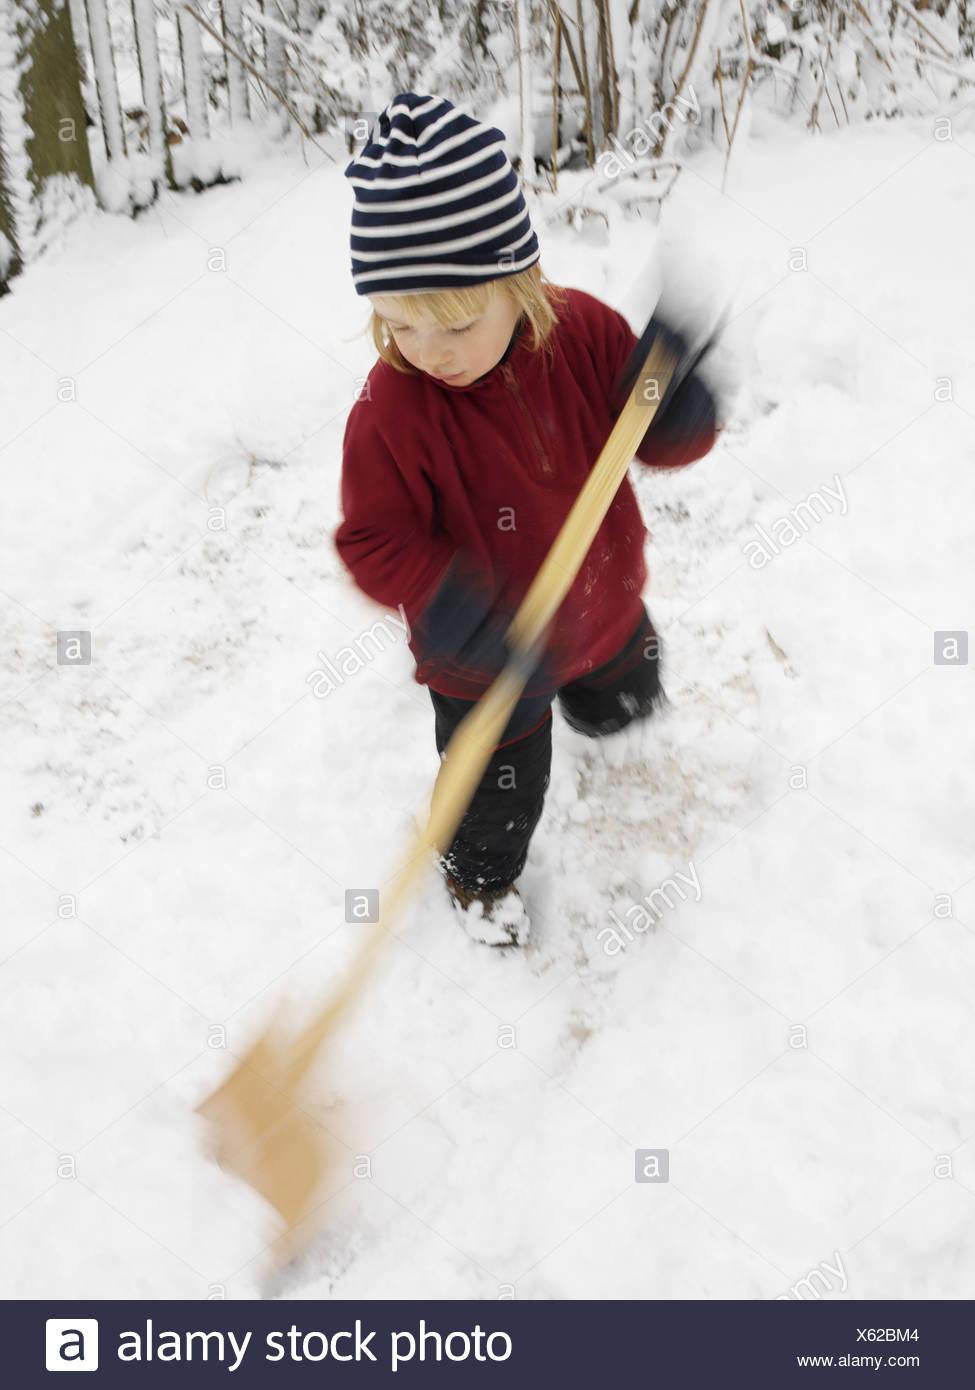 Give birth winter-clothing snow-shovels 4 years child blond ski-pants sweaters cap snow-shovel shovel shovels snow-evacuates - Stock Image